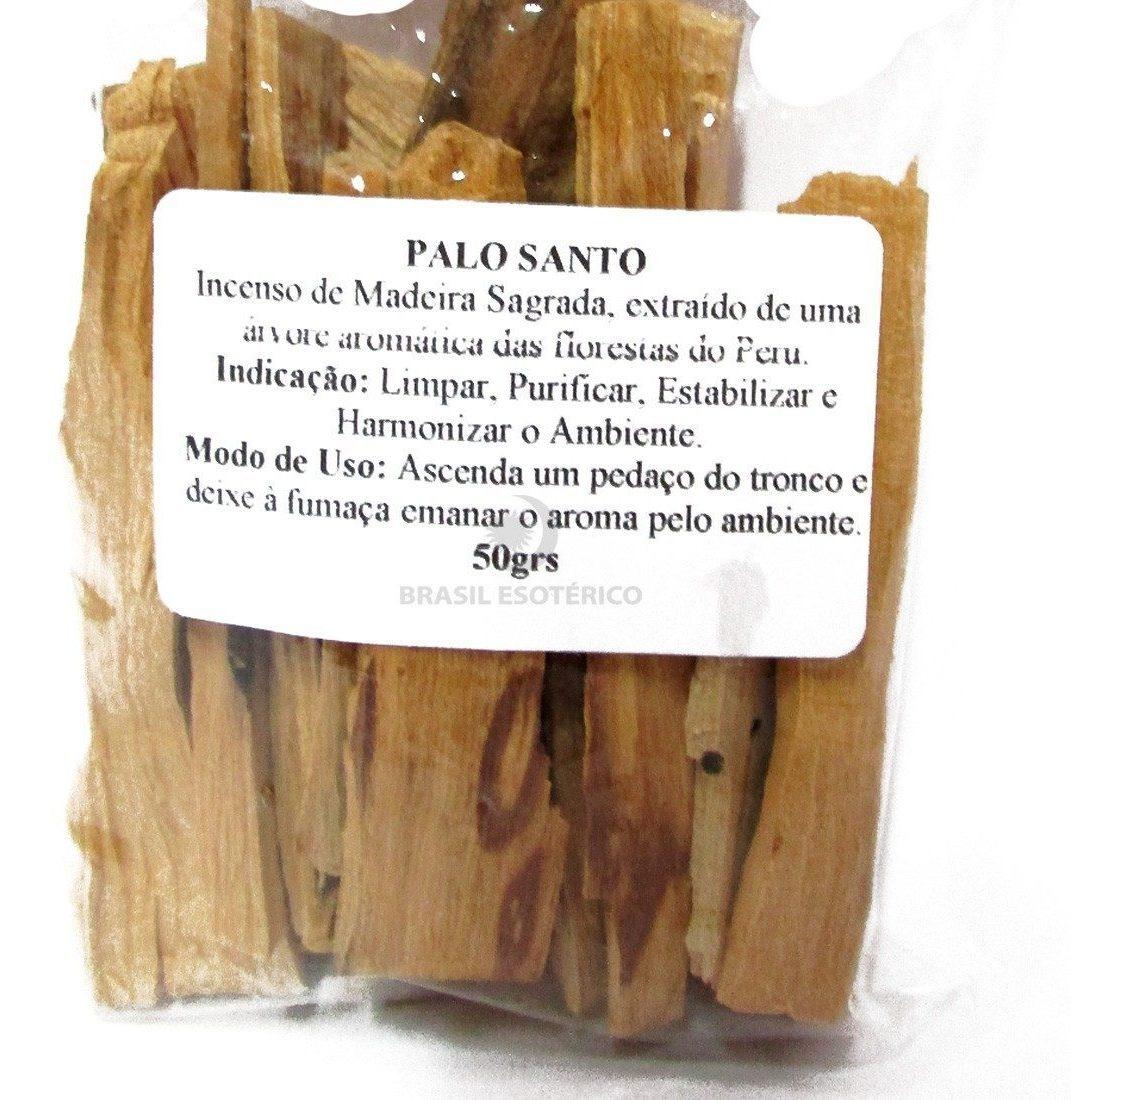 Palo Santo Incenso.Incenso Palo Santo Sagrado 100 Natural 50 Gramas